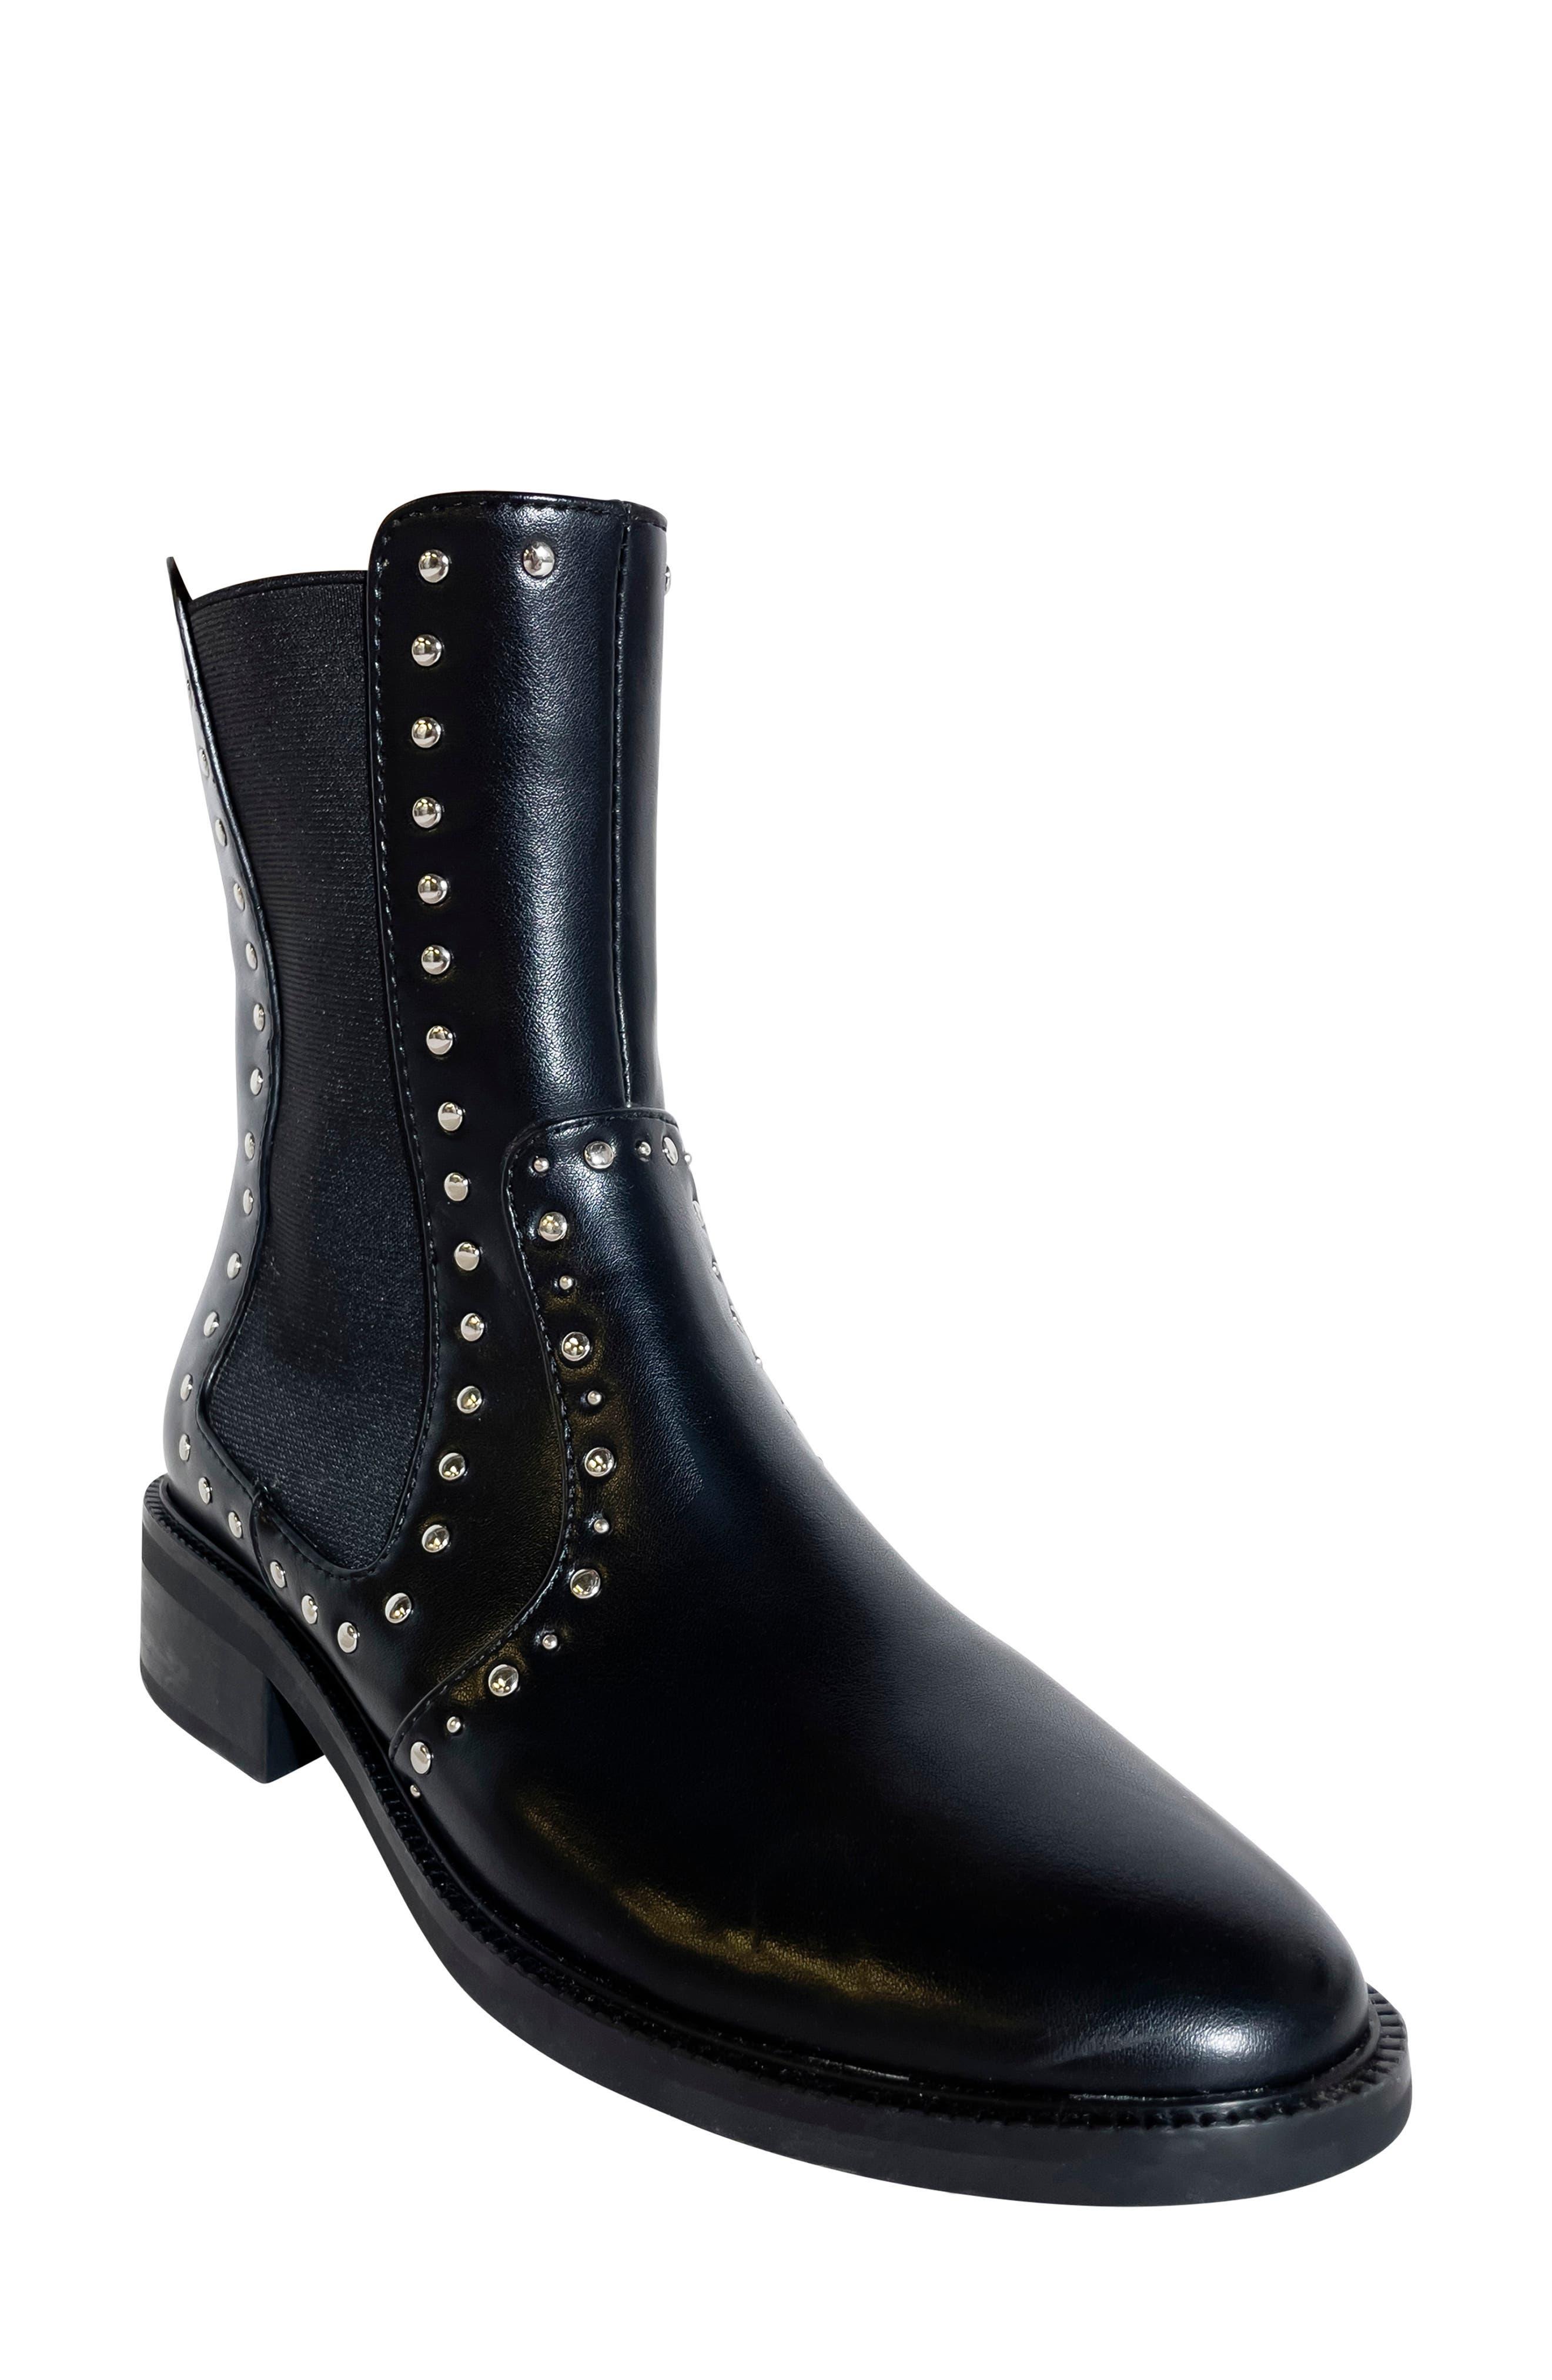 East Chelsea Boot